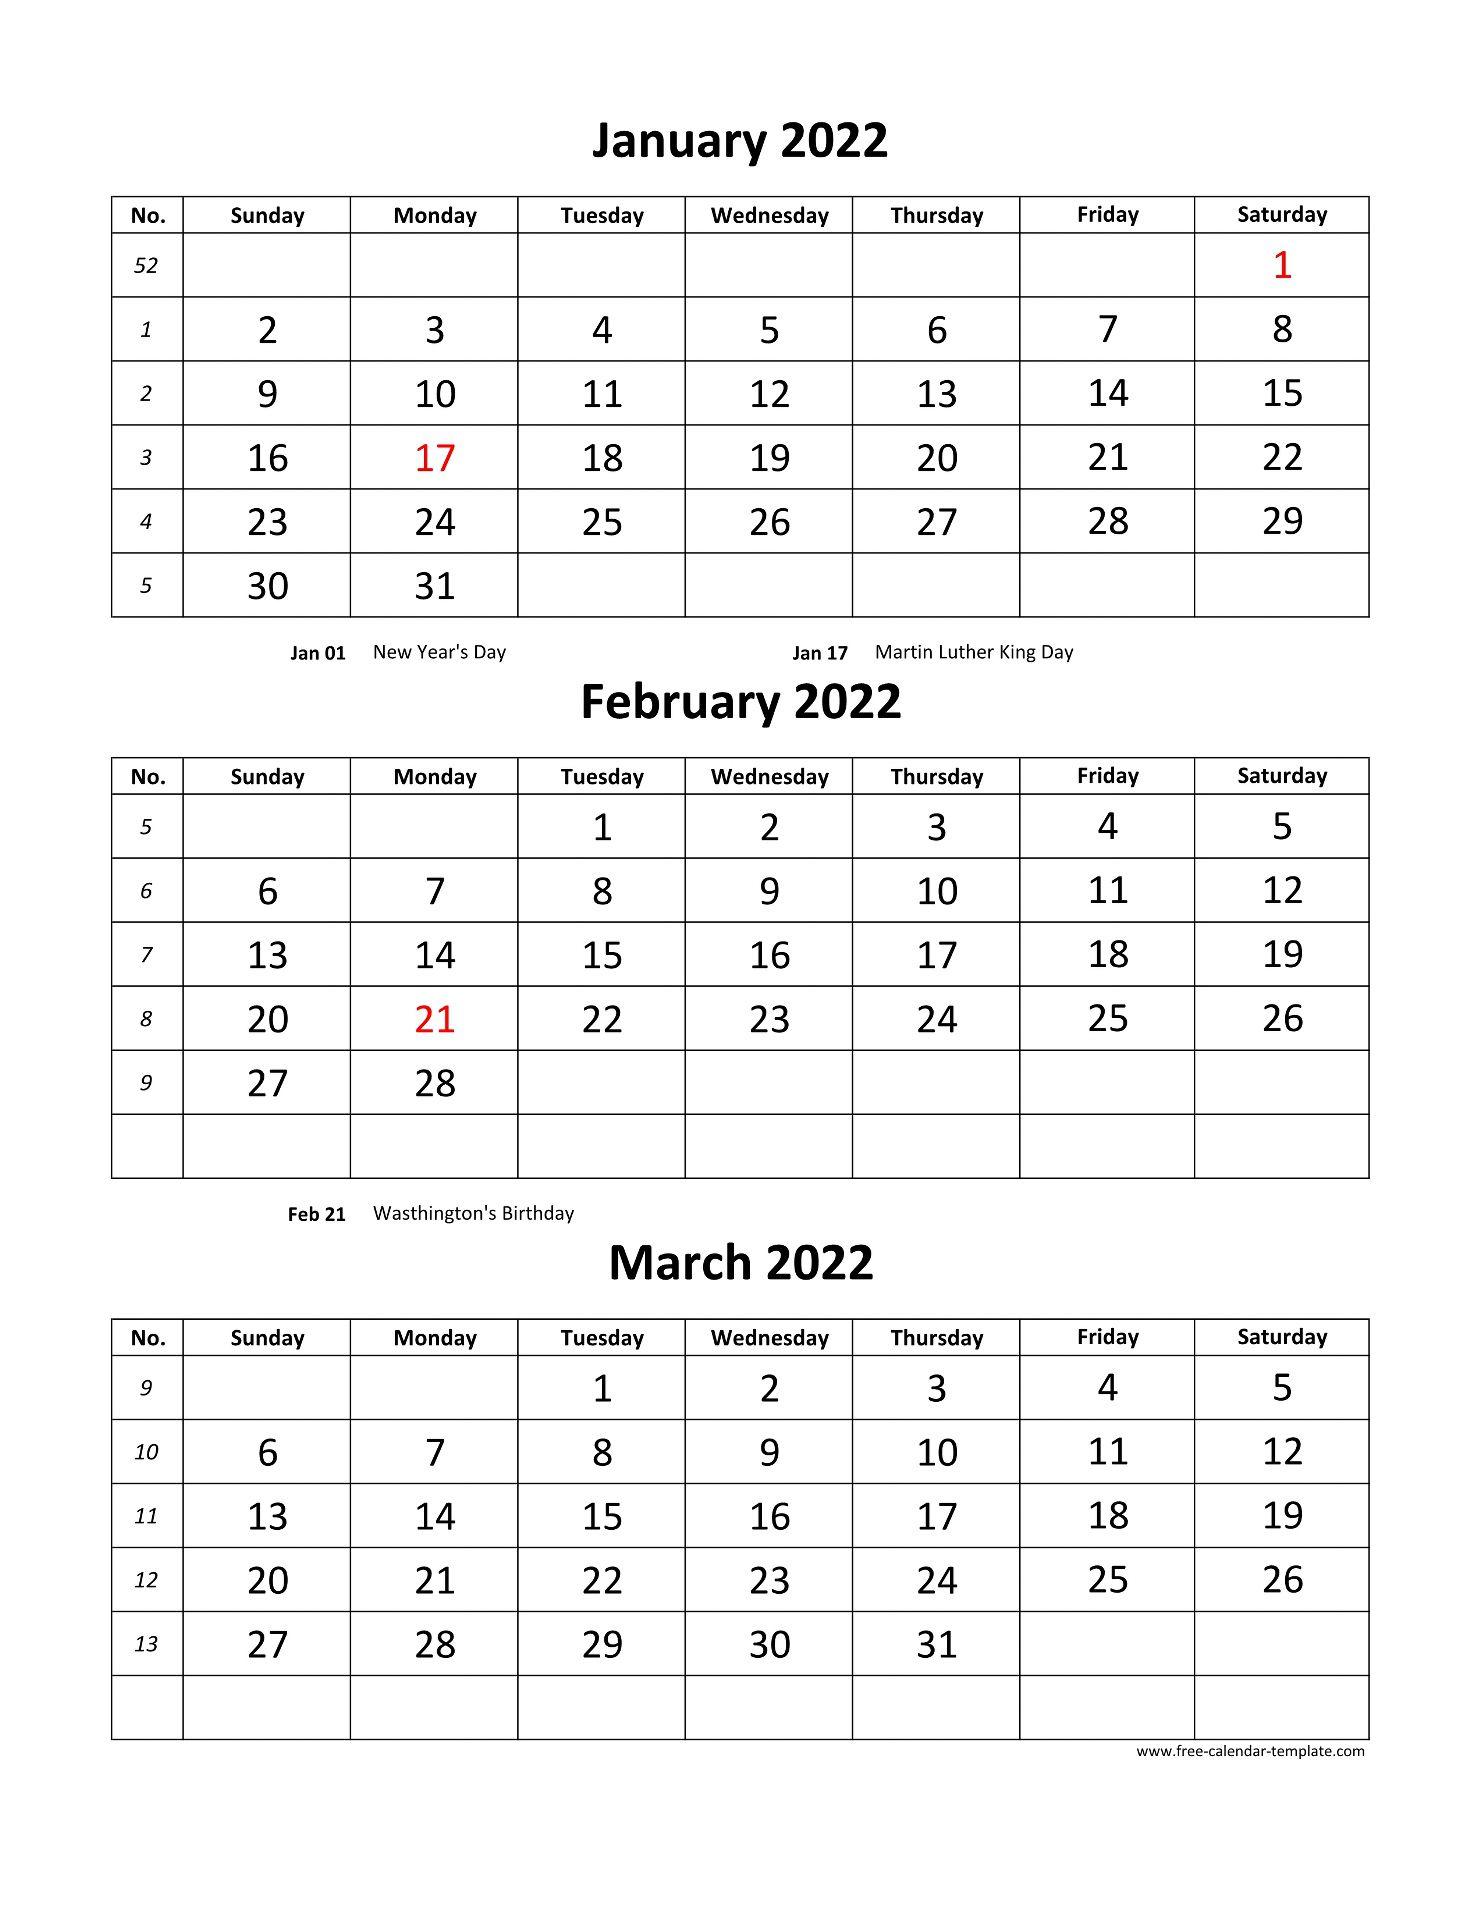 3 Month Calendar 2022.Free Monthly Calendar 2022 3 Months Per Page Vertical Free Calendar Template Com